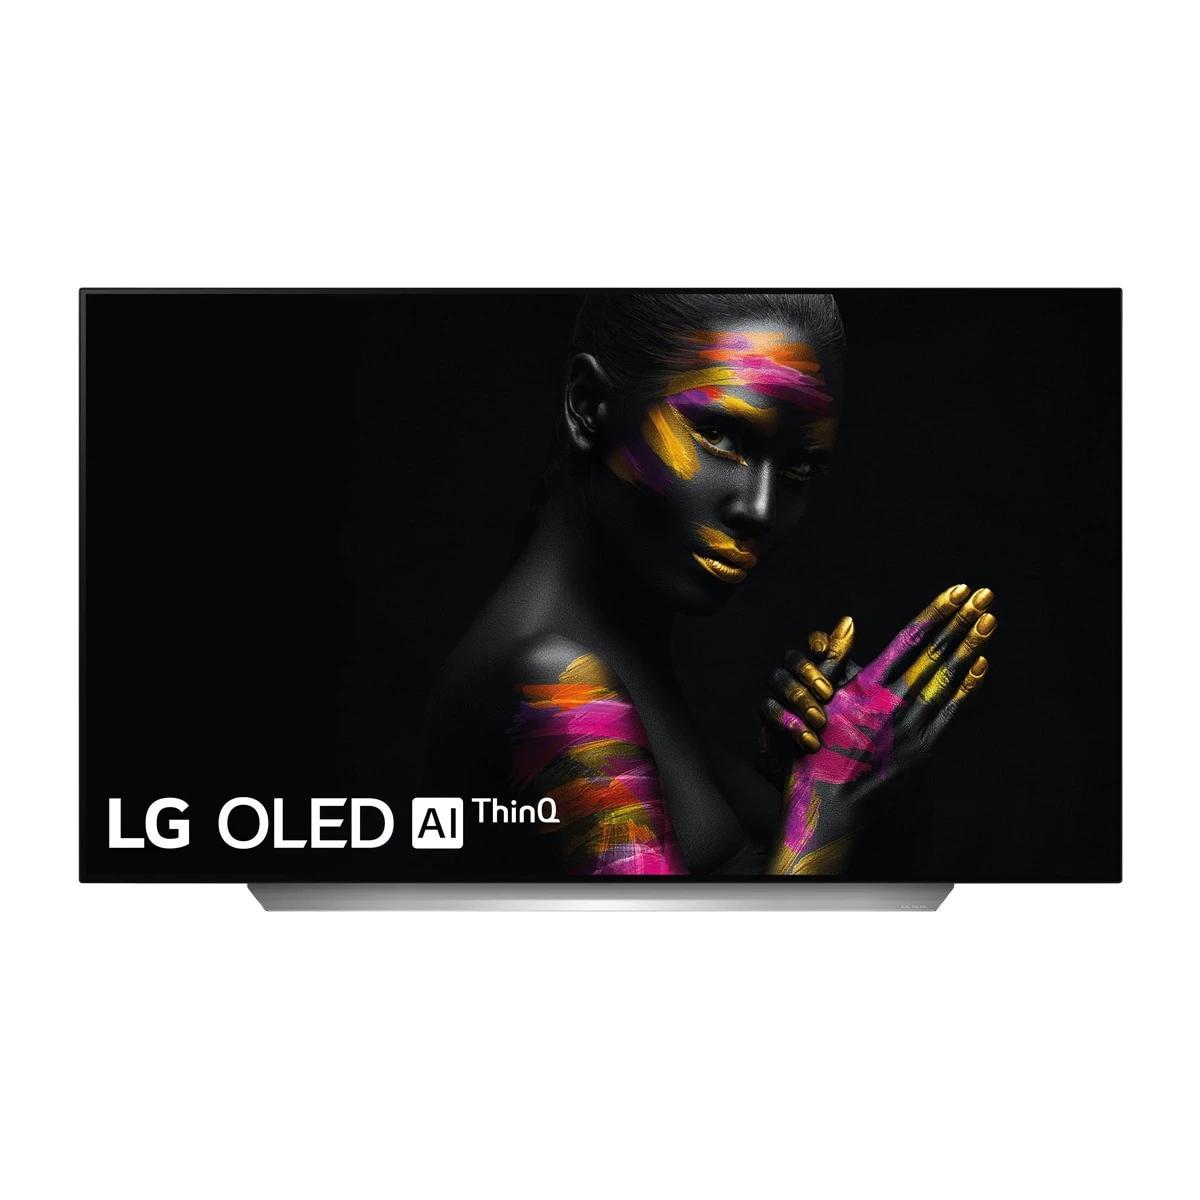 TV OLED LG OLED65C9MLB UHD 4K HDR Smart TV con IA (Reacondicionado A)